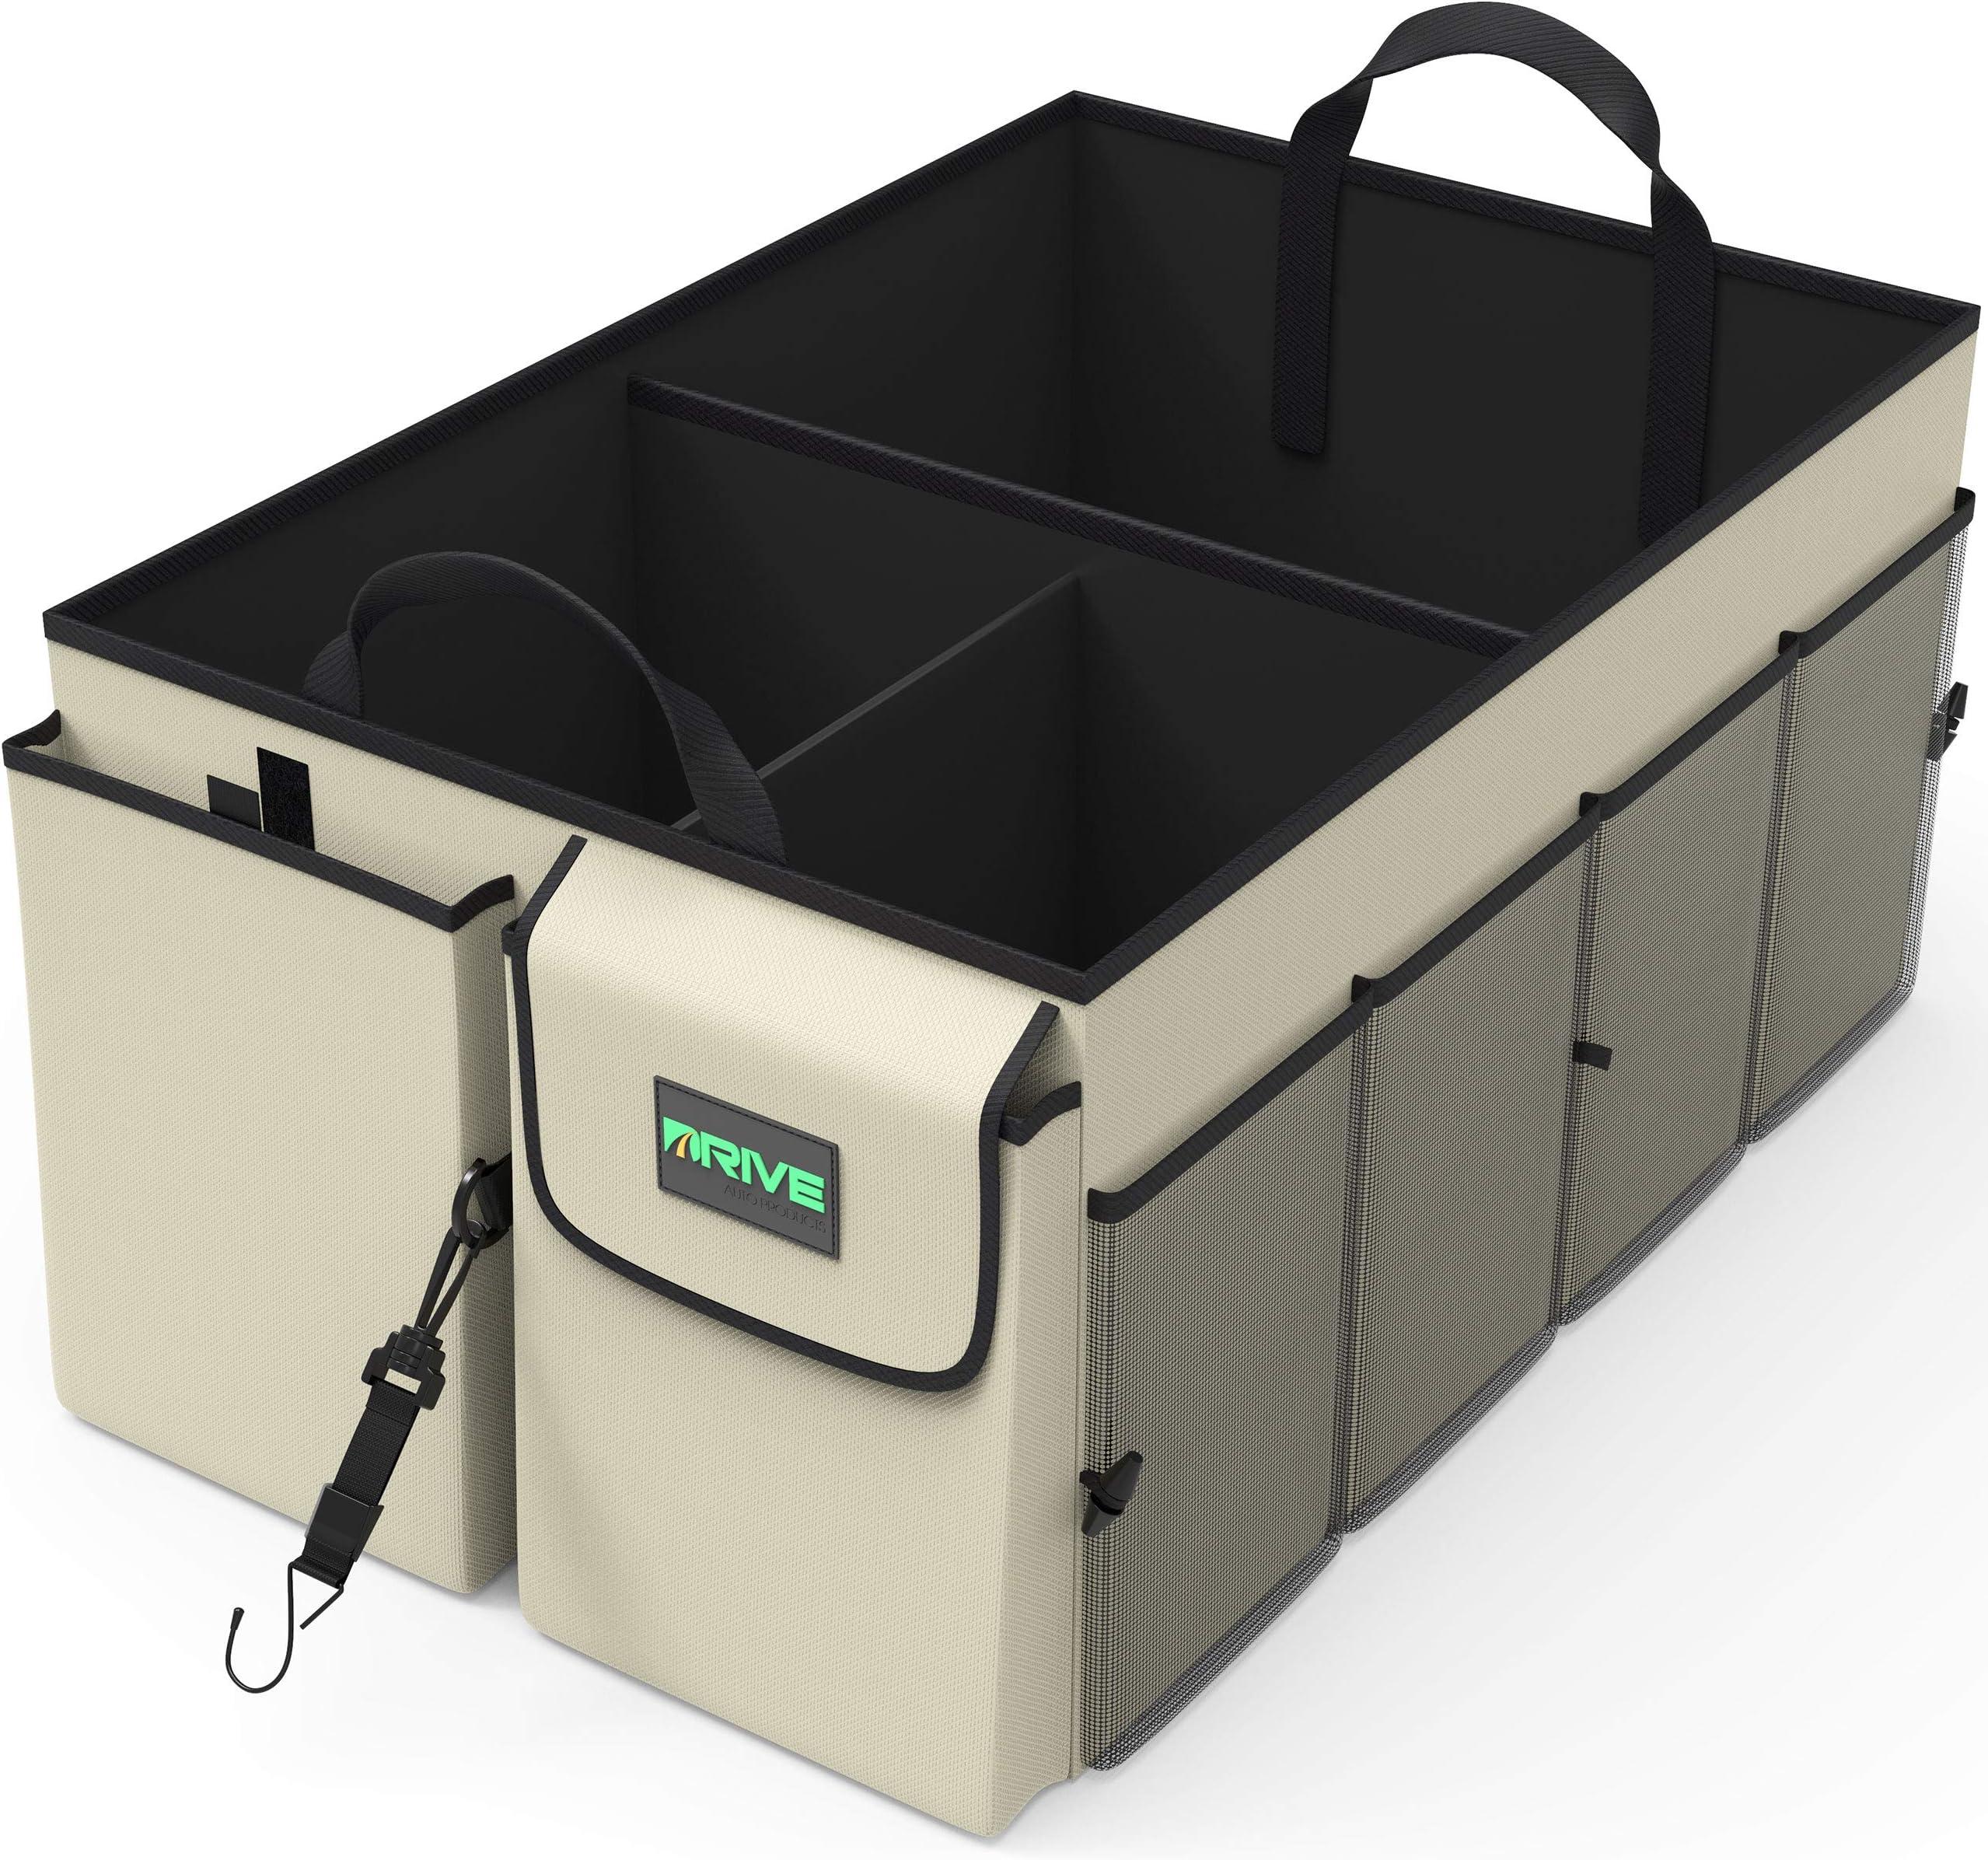 Drive Auto Trunk Organizers and Storage - Collapsible Multi-Compartment Car Organizer w/ Adjustable Straps - Automotive Consoles & Organizers (Black)